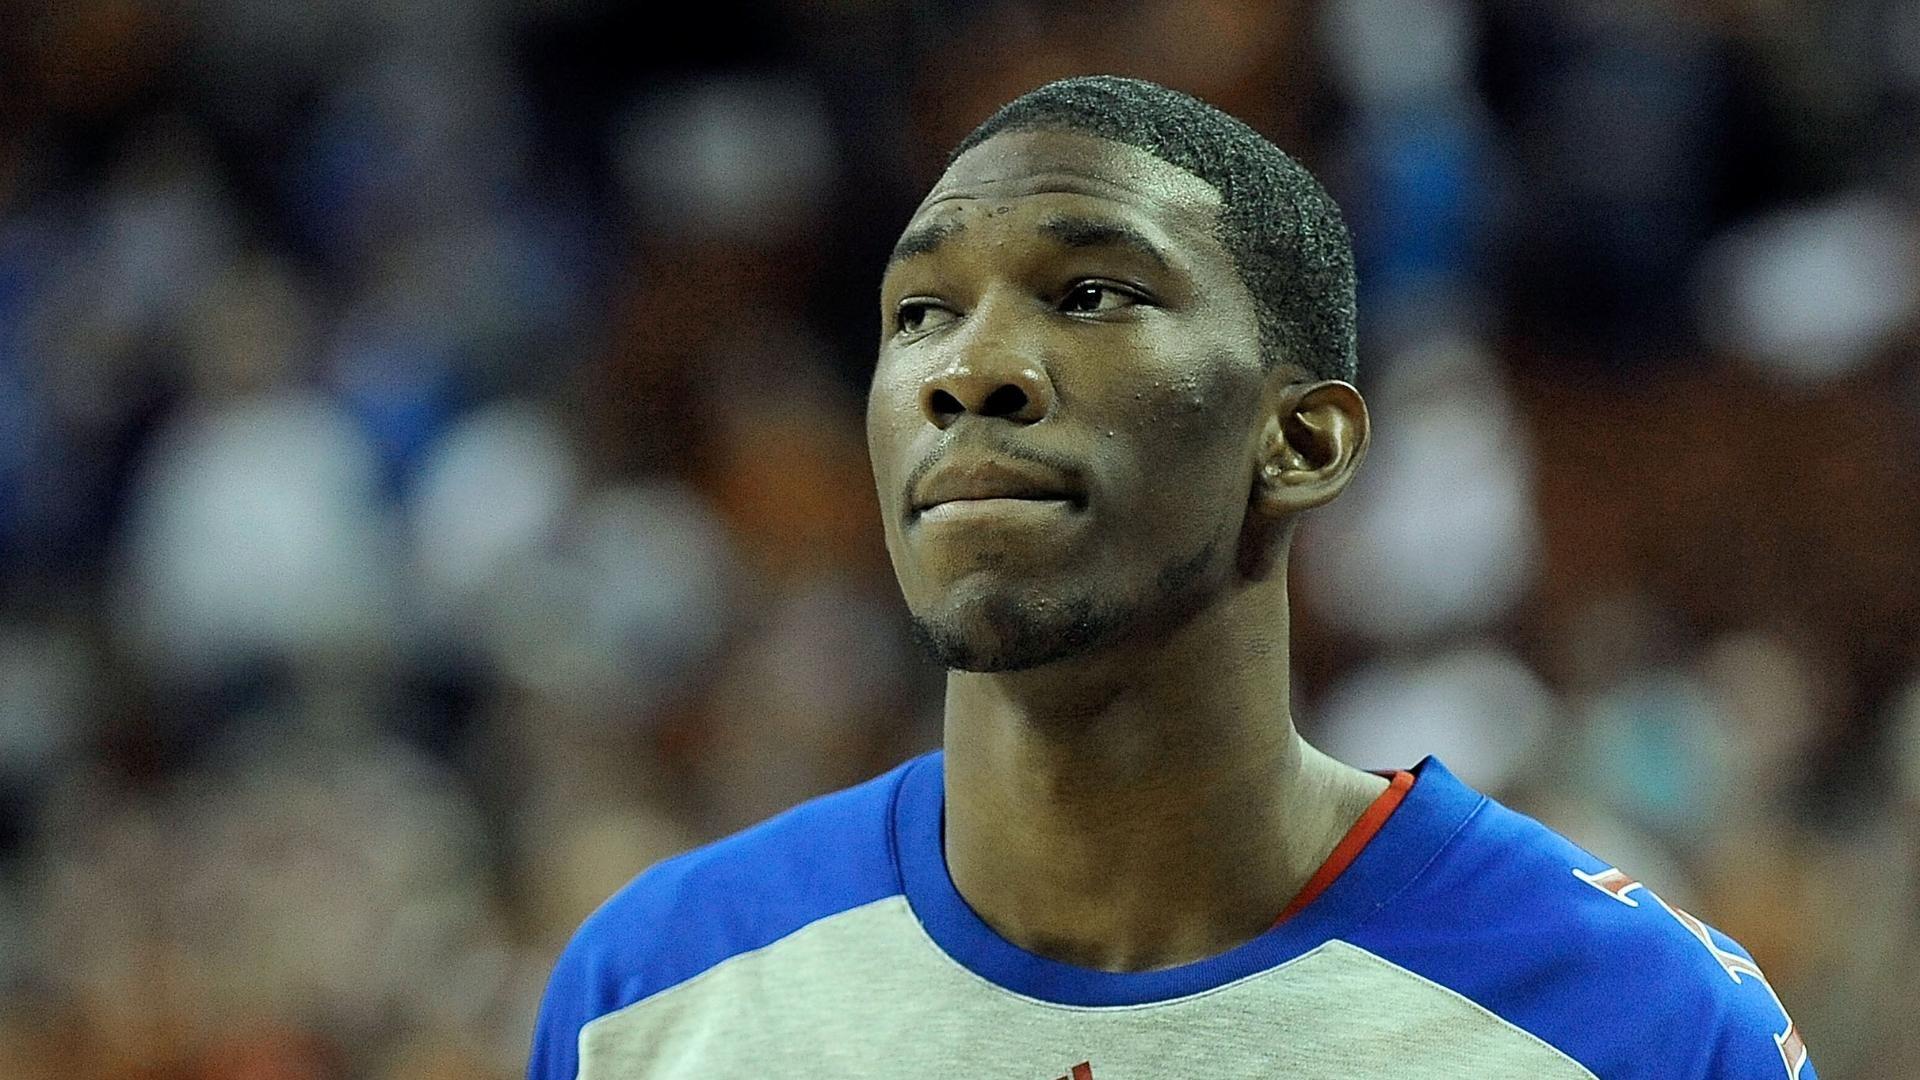 NBA Draft Prospect: Joel Embiid